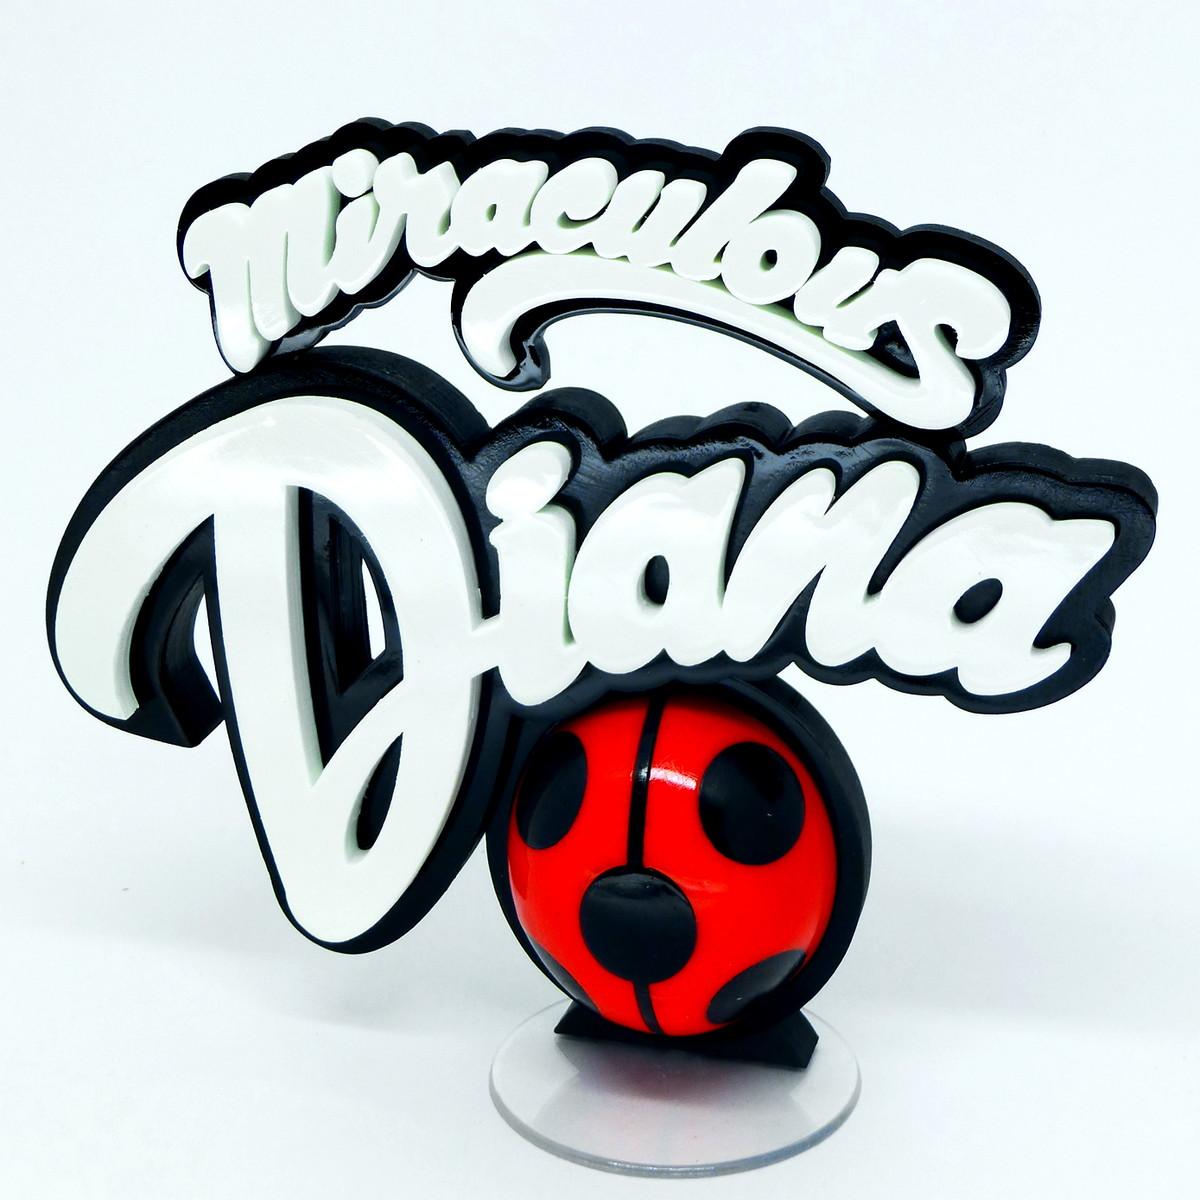 Miraculous Ladybug - Logo Personalizado | Impressione 3D ...